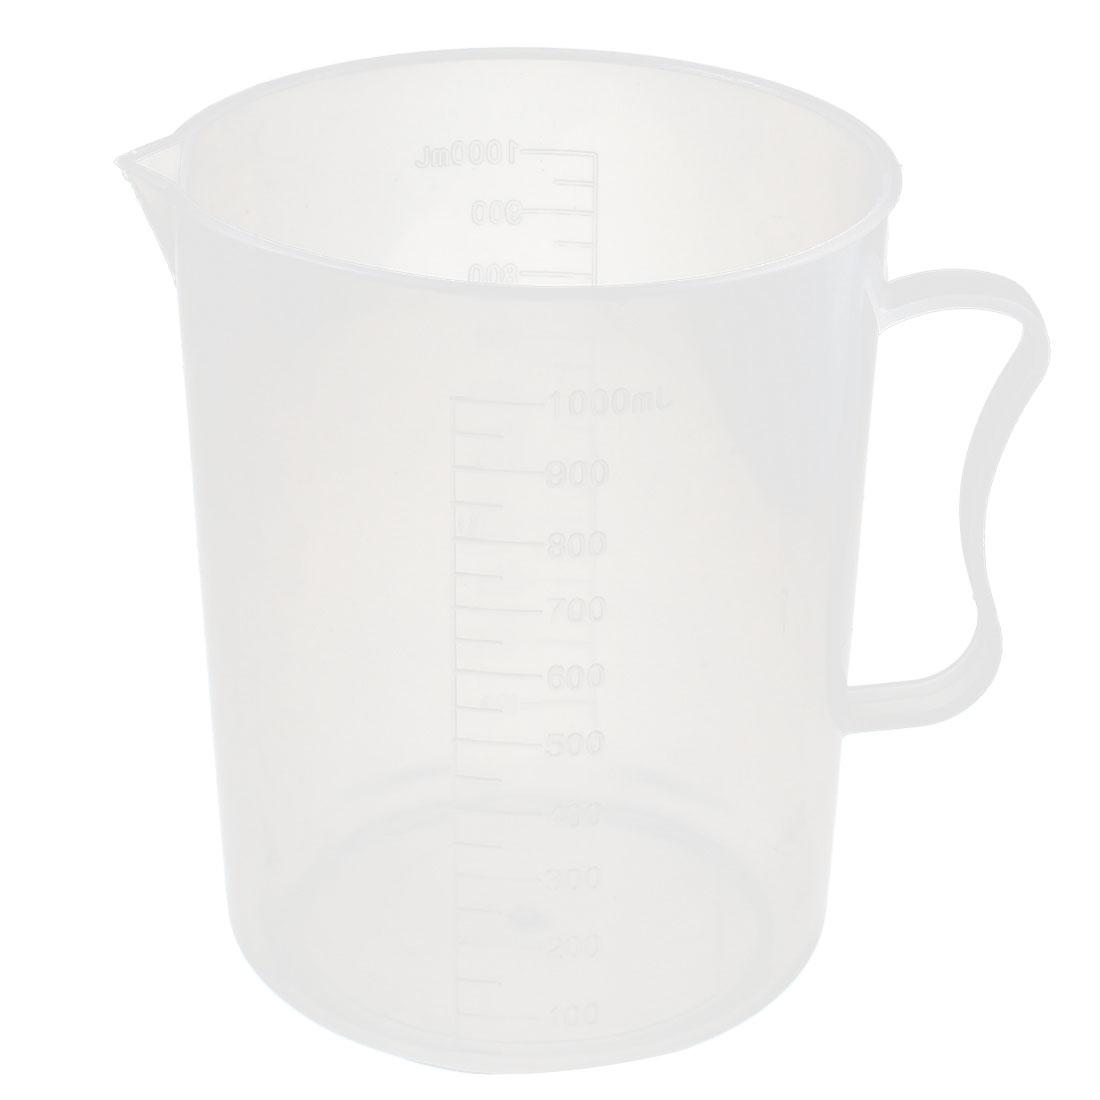 Lab Laboratory Chemistry Experiment 1000mL Graduated Plastic Liquid Water Testing Measuring Measure Cup w Handle